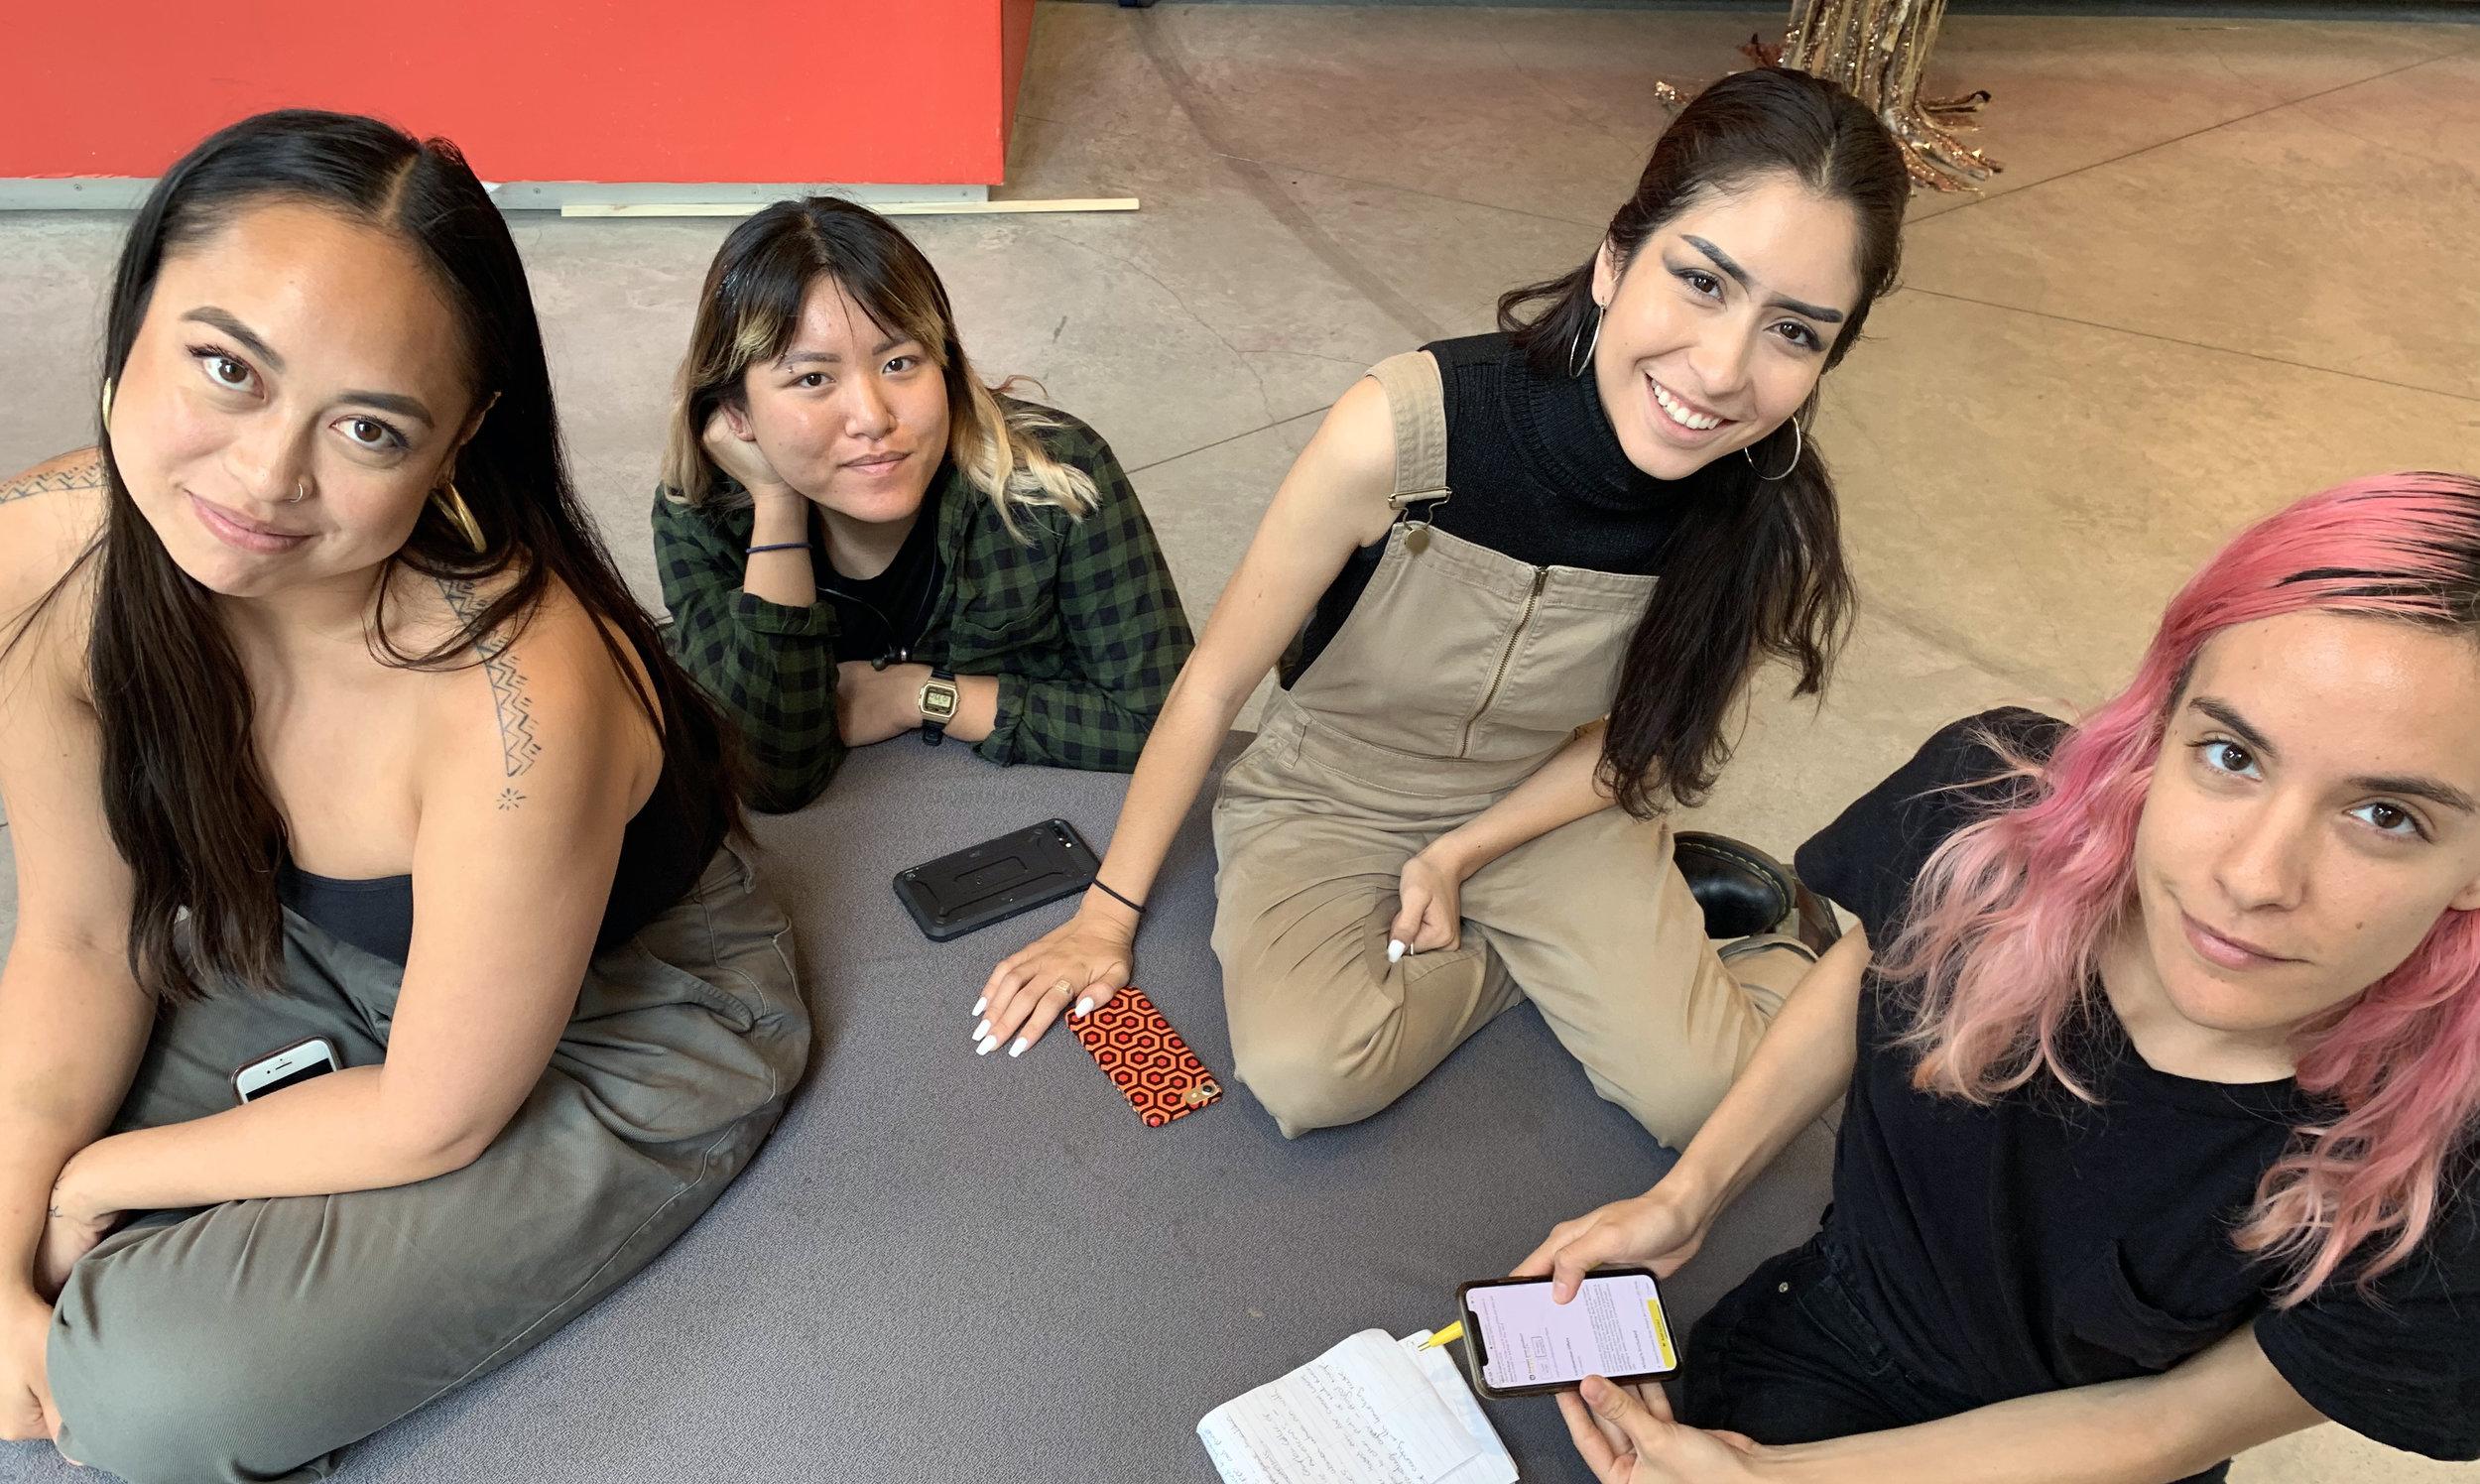 2019 SUMMER CREW    Caroline Garcia , Performance Artist  Collaborator:  Sonia Colunga  (The New School)  Mentees via New York Arts Practicum:  Sam Fresquez  (Arizona State University),  Vivienne Le  (Stanford)